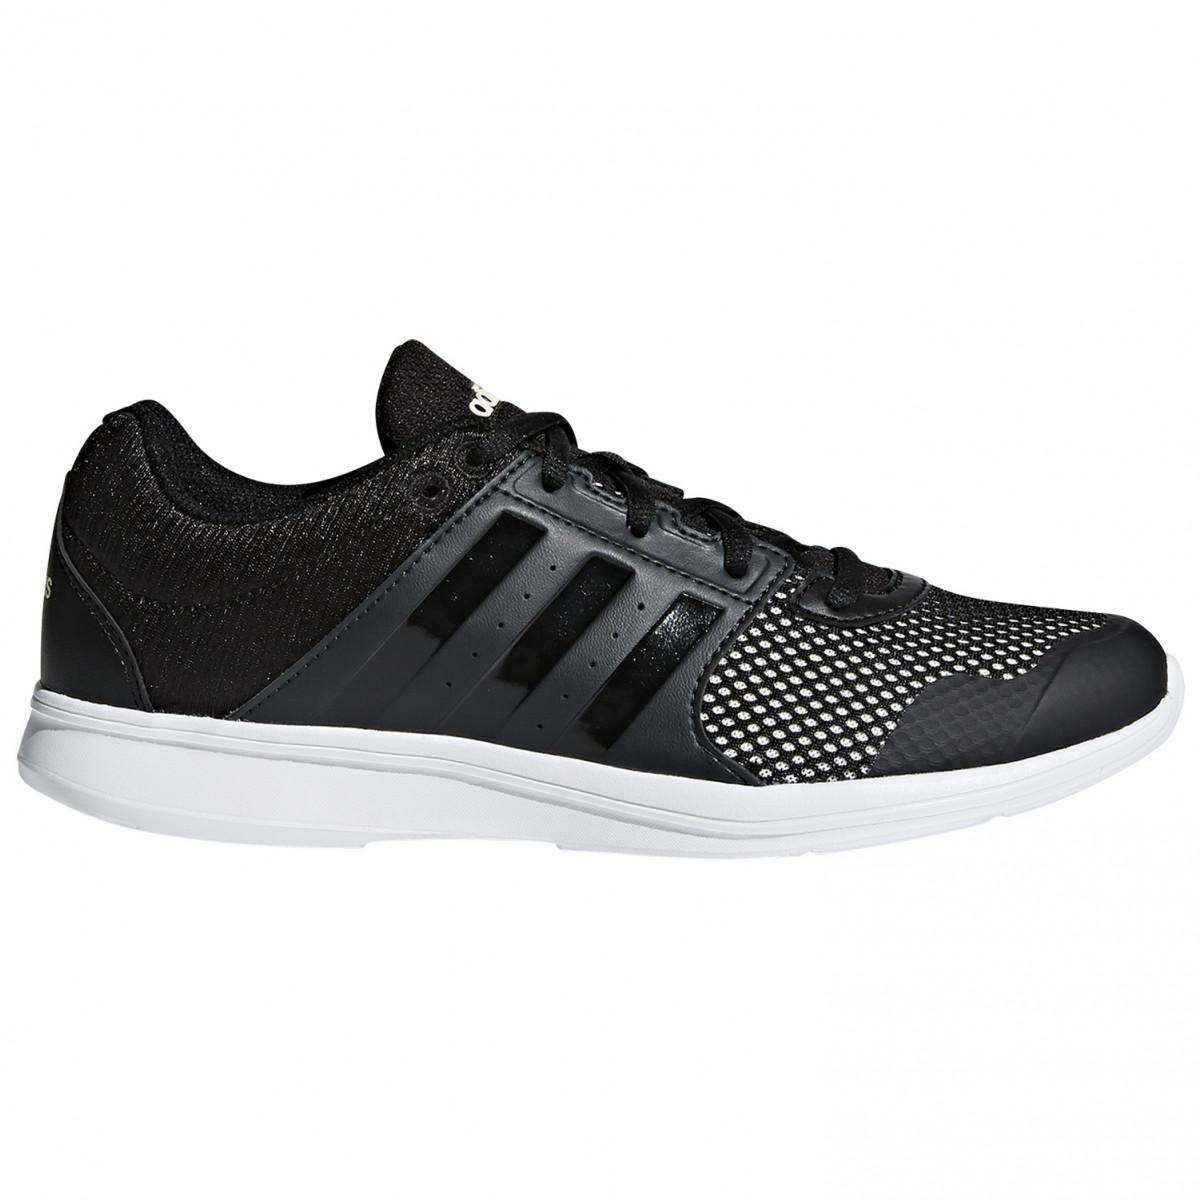 6e0b1ed9d Zapatillas Adidas Essential Fun II - Mujer - 20% OFF